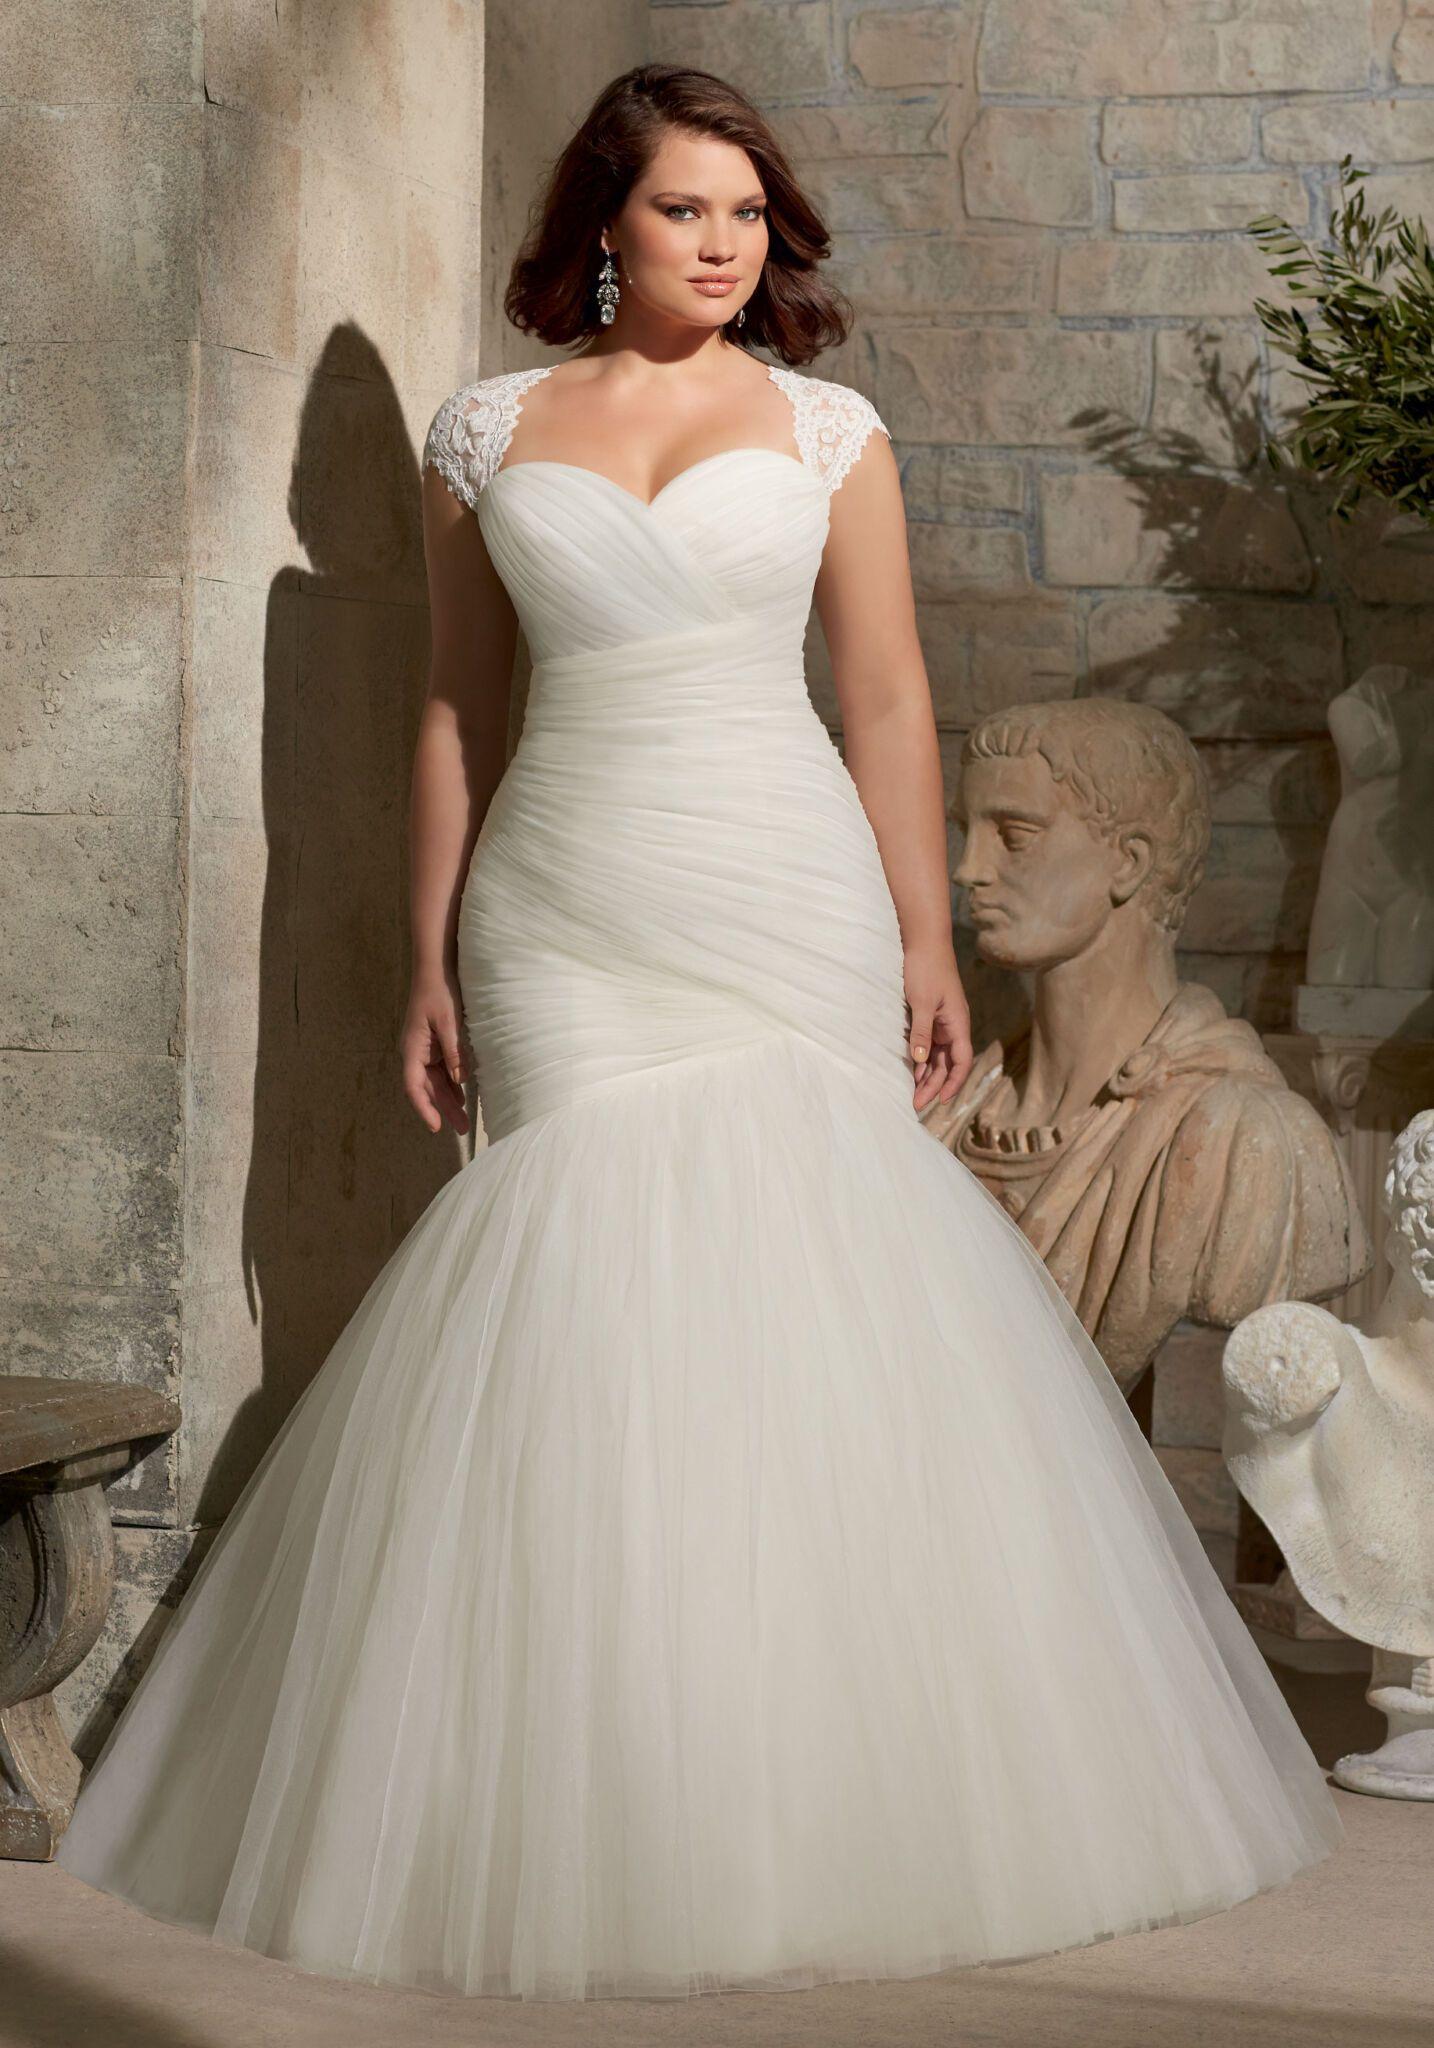 Net Wedding Dress With Lace Appliques Morilee Trendy Wedding Dresses Wedding Dresses Ball Gowns Wedding [ 2048 x 1434 Pixel ]